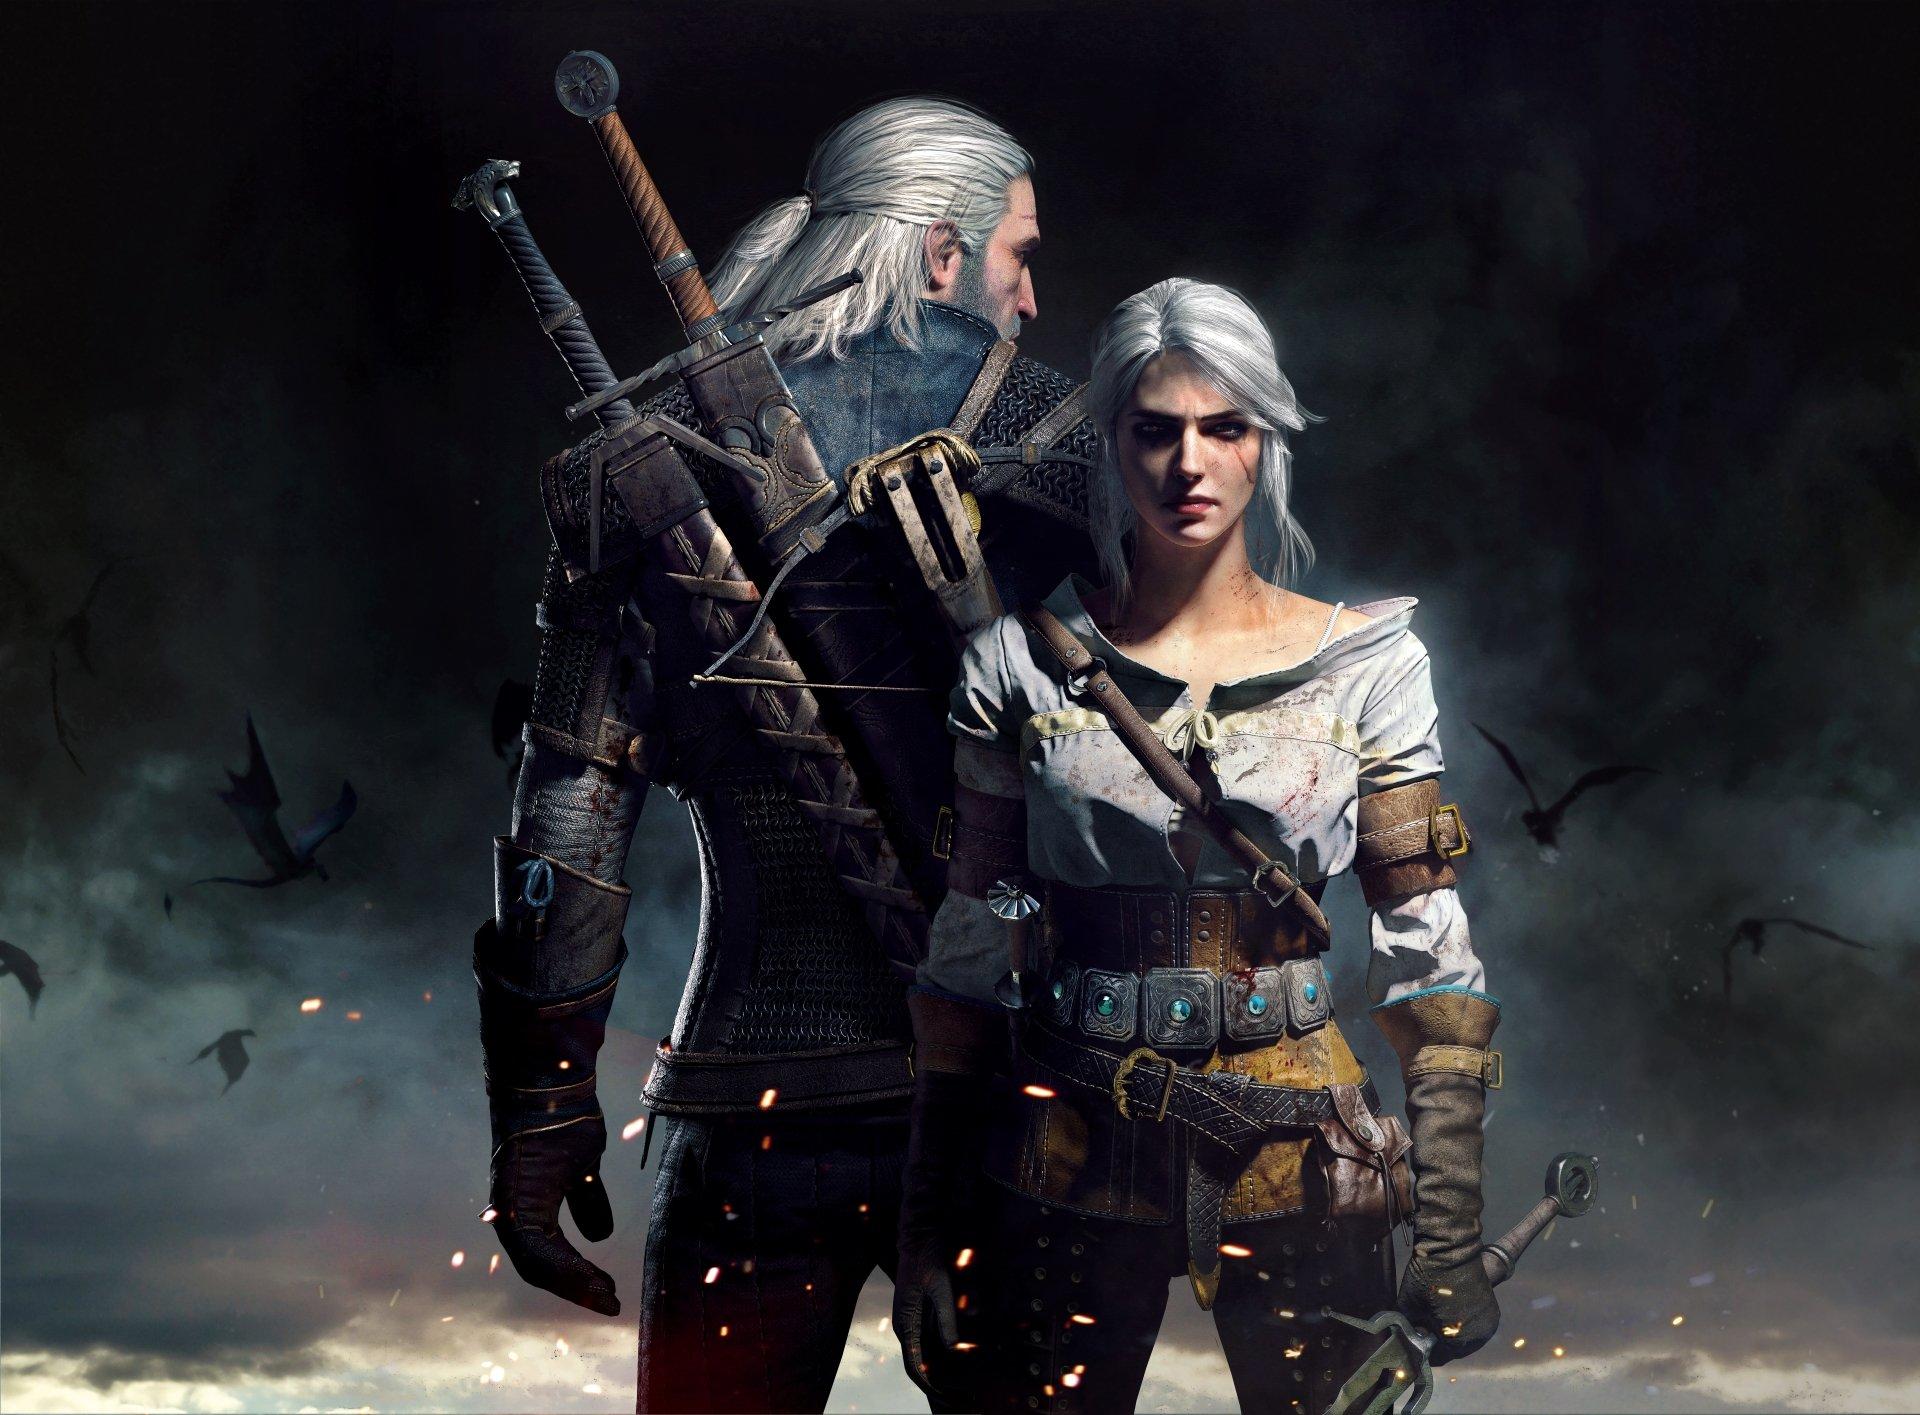 عرضه Witcher 3 بر روی سرویس Xbox Game Pass